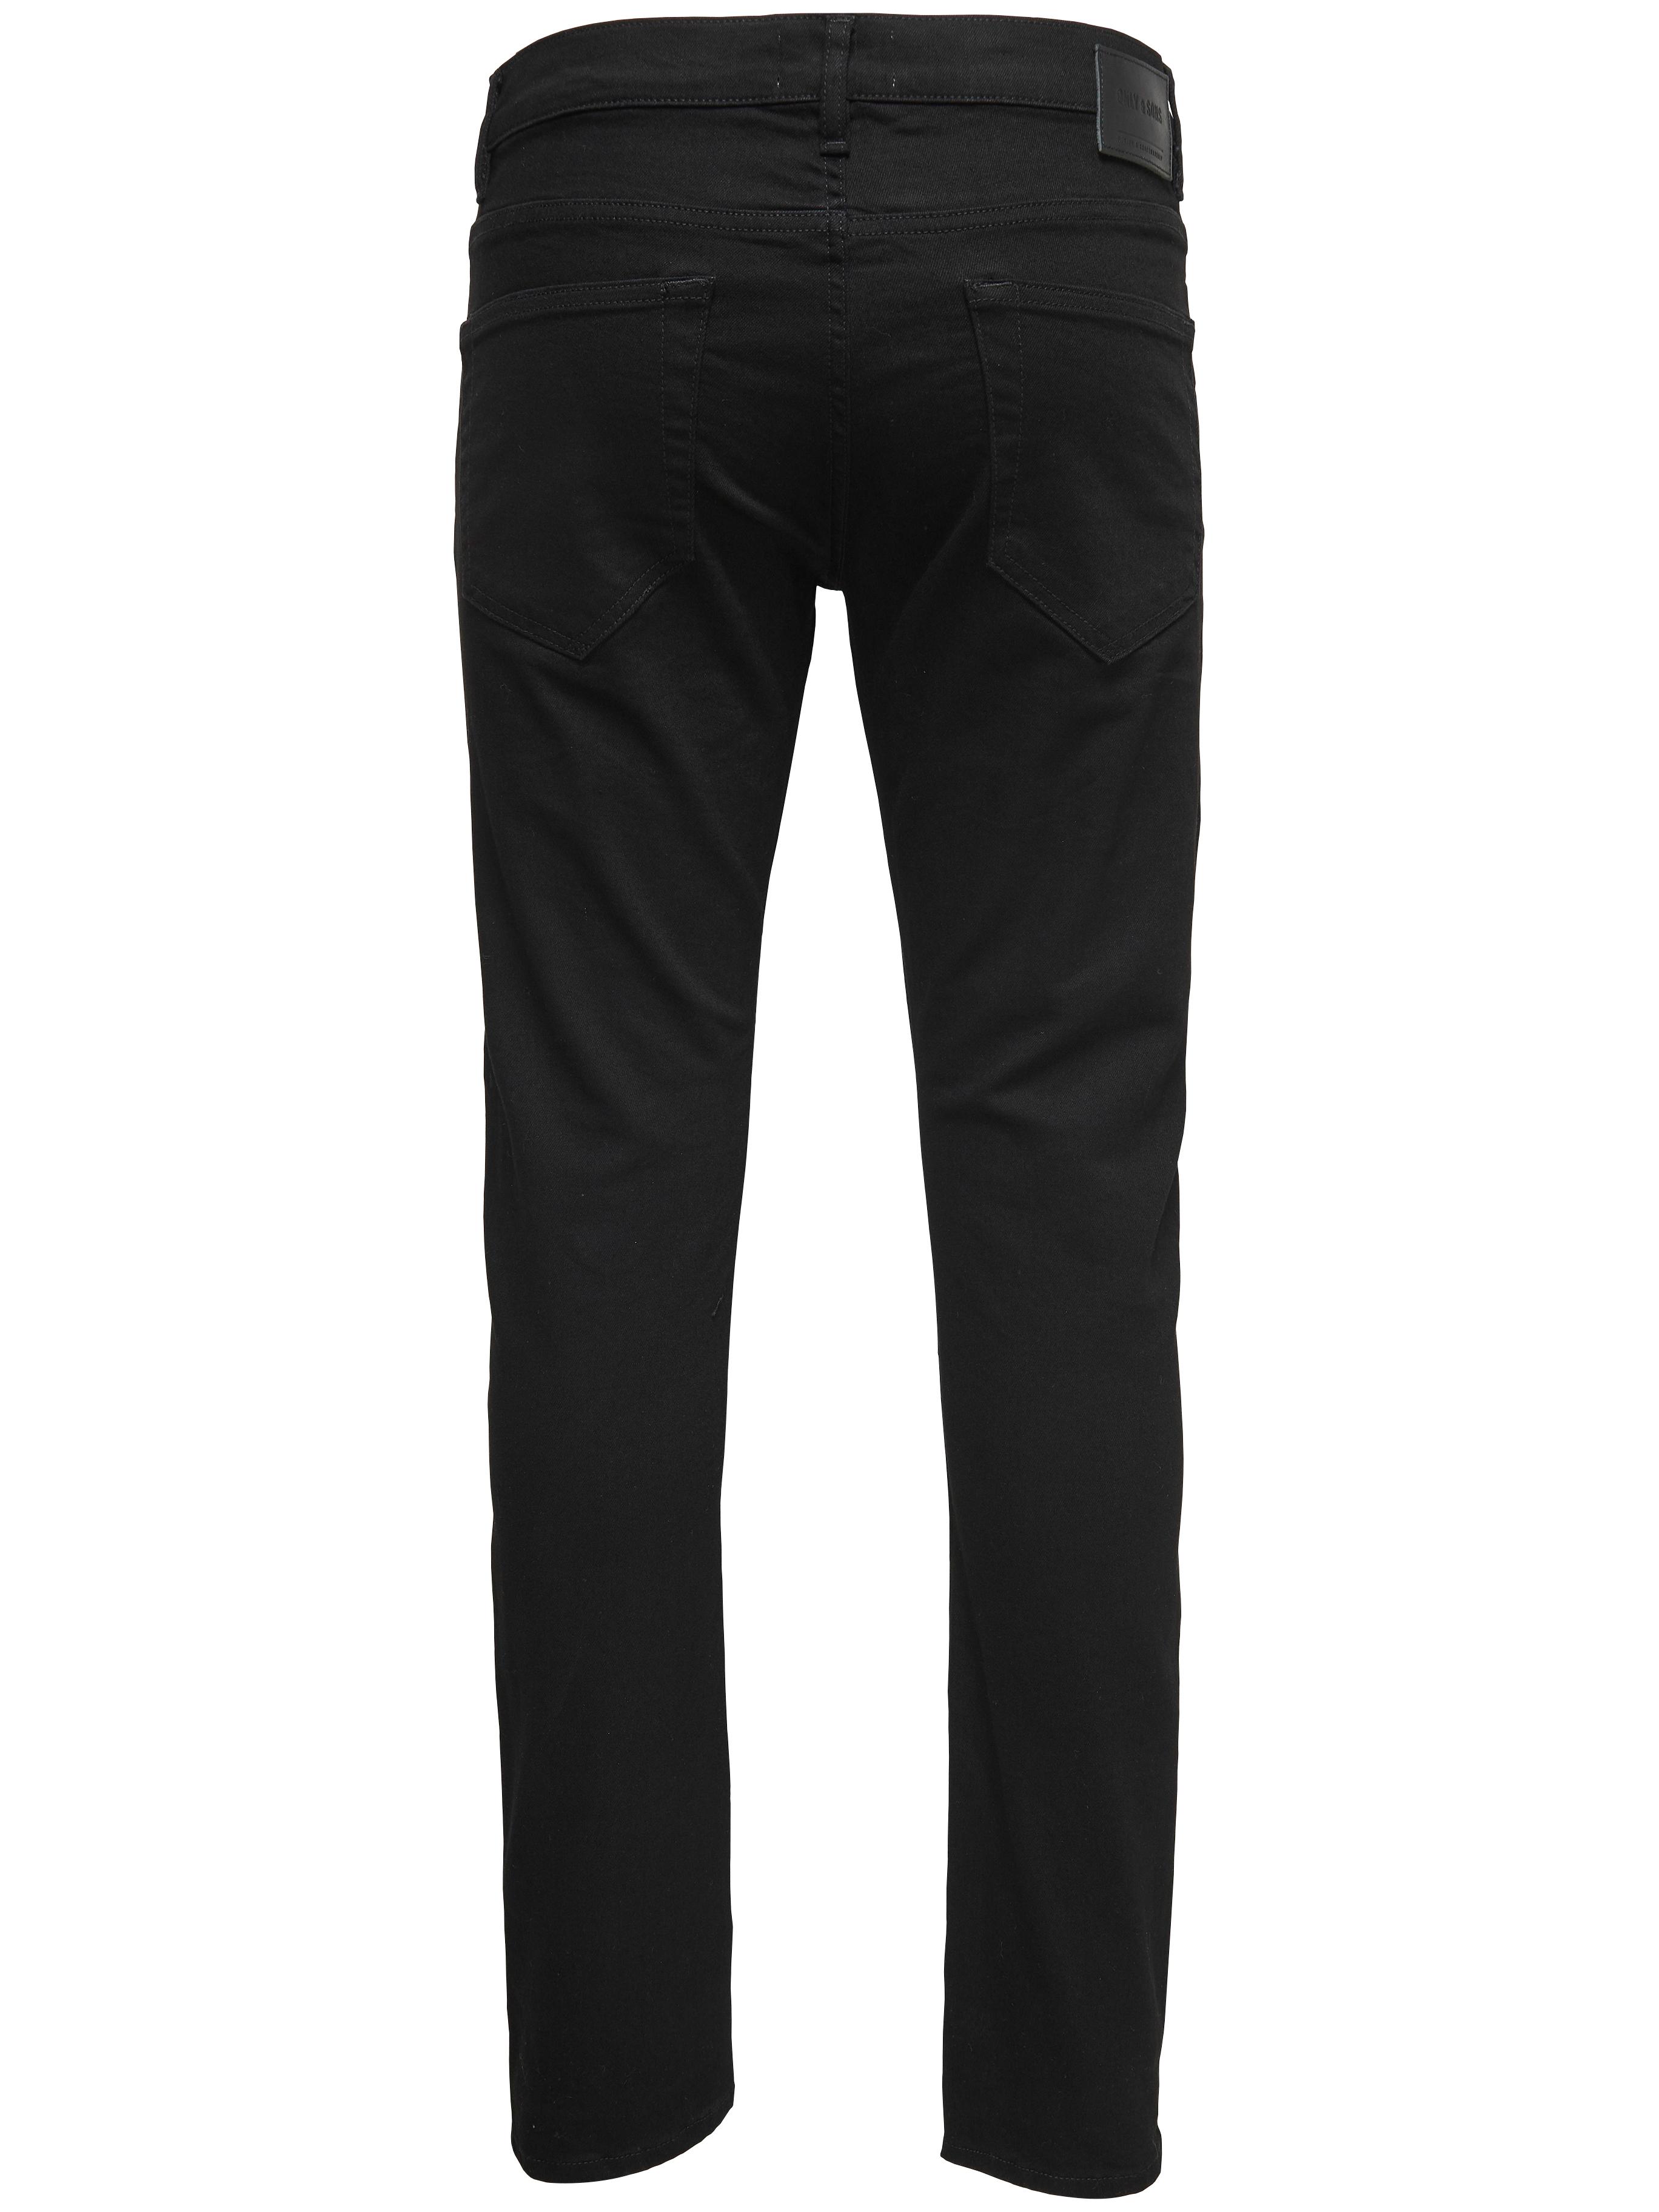 Performance Jeans, Only & Sons, Loom jeans, slim fit, black denim, 30/30